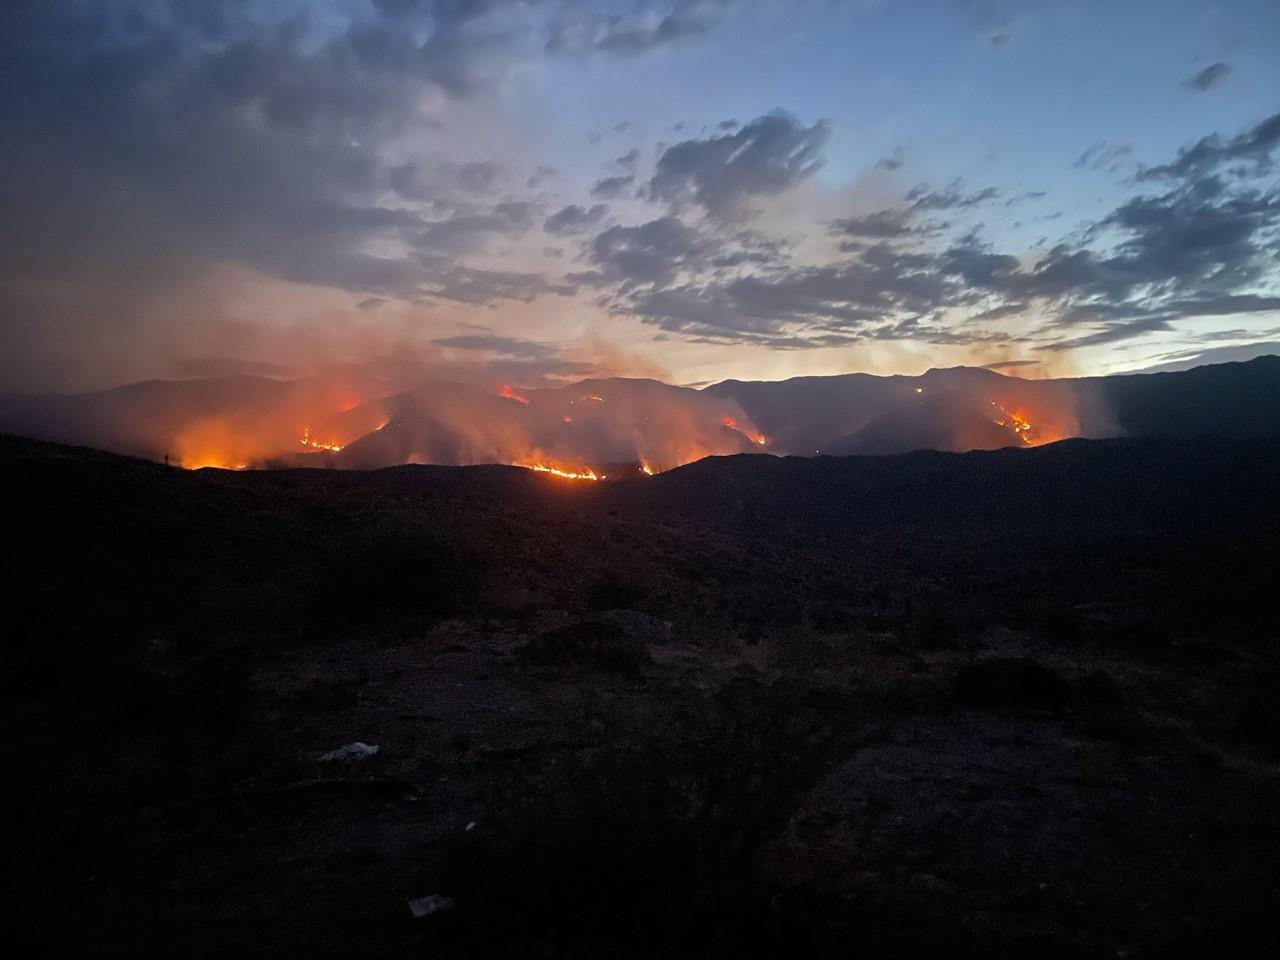 The Tiger Fire in central Arizona